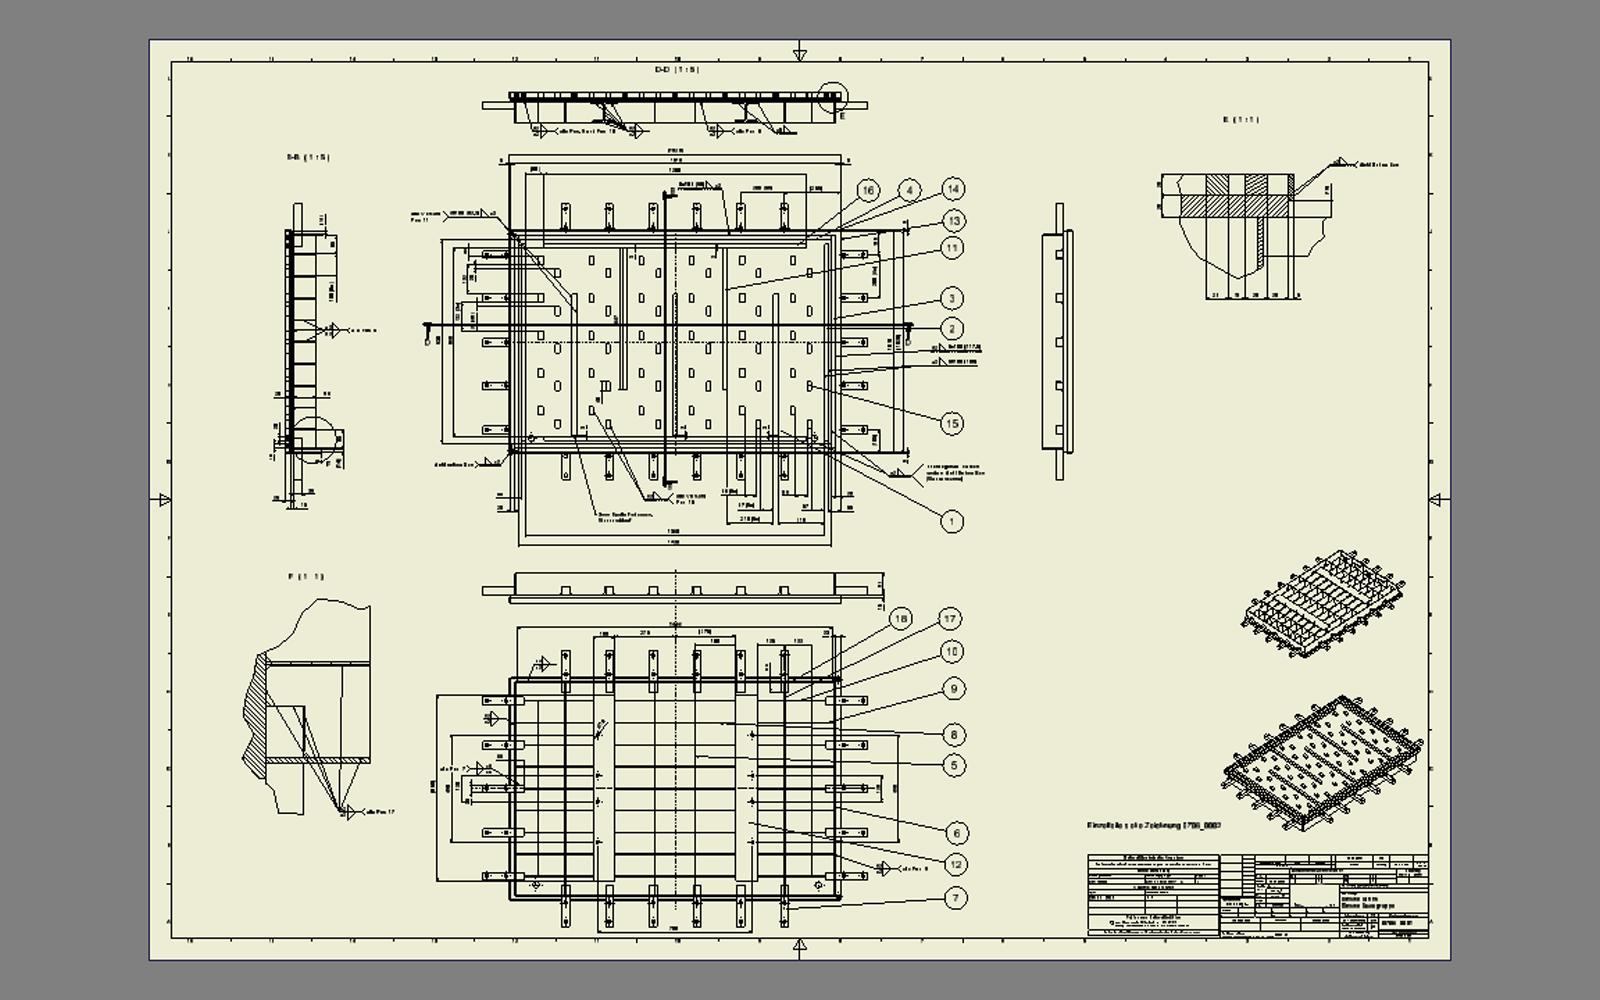 conap cad konstruktionsb ro cad modell eines. Black Bedroom Furniture Sets. Home Design Ideas